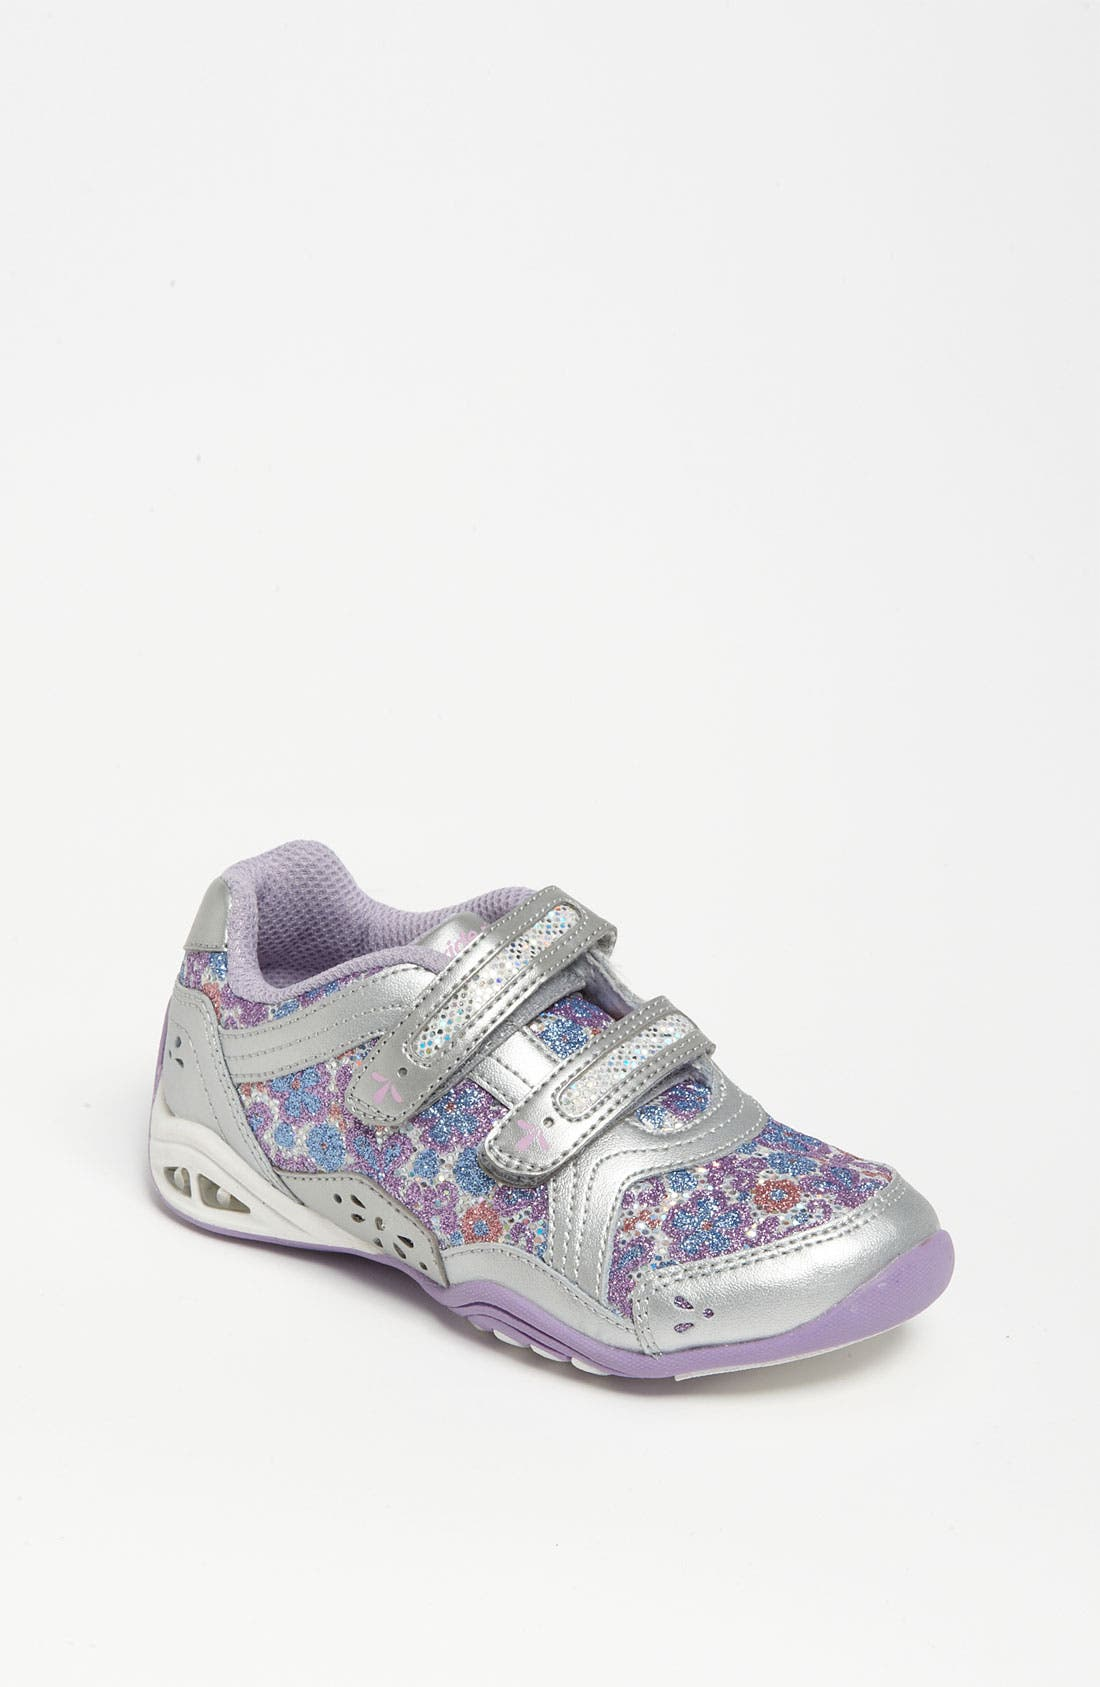 Main Image - Stride Rite 'Jade' Sneaker (Walker, Toddler & Little Kid)